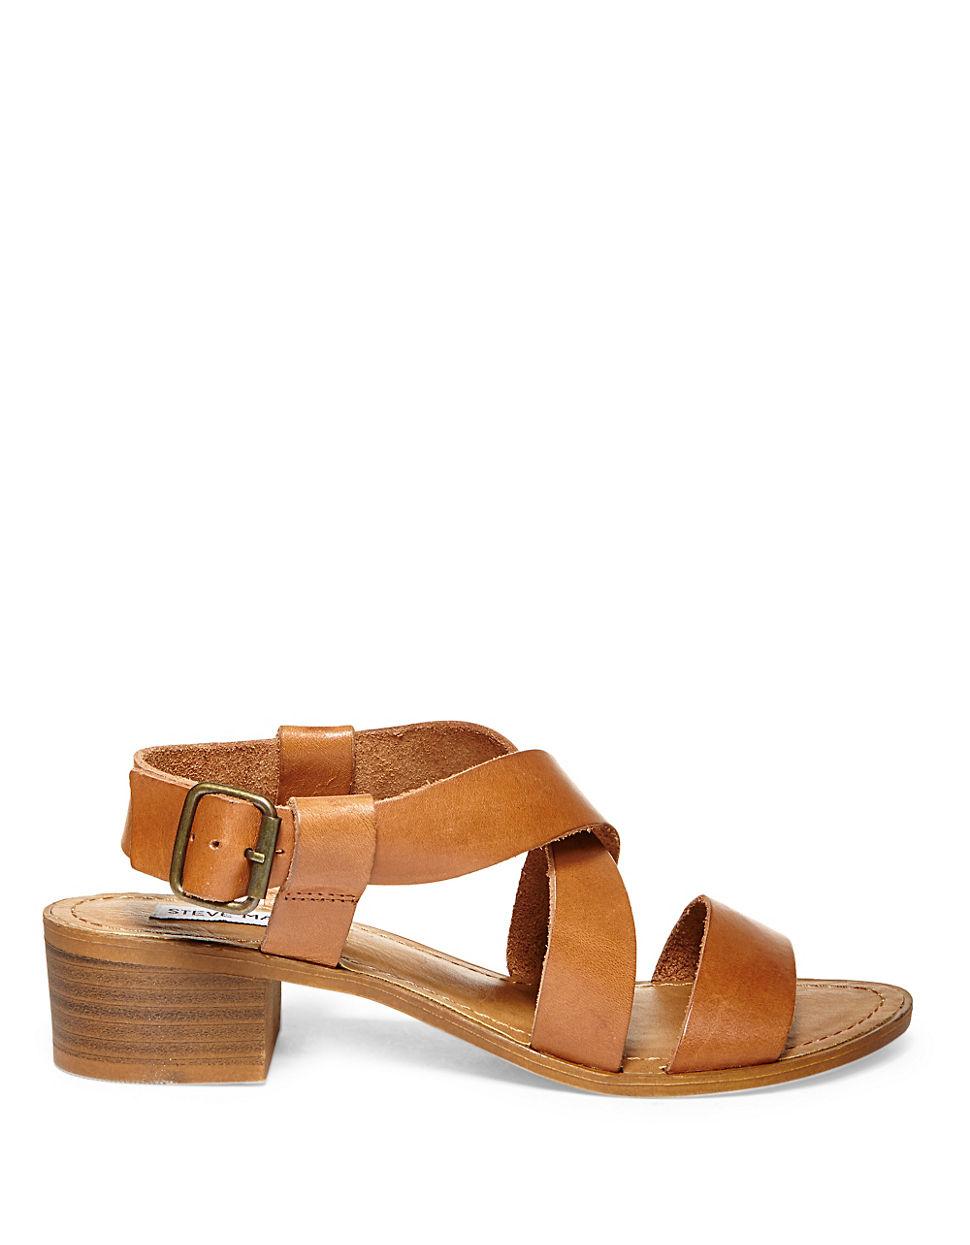 Steve Madden Lorelle Crisscross Leather Sandals In Brown